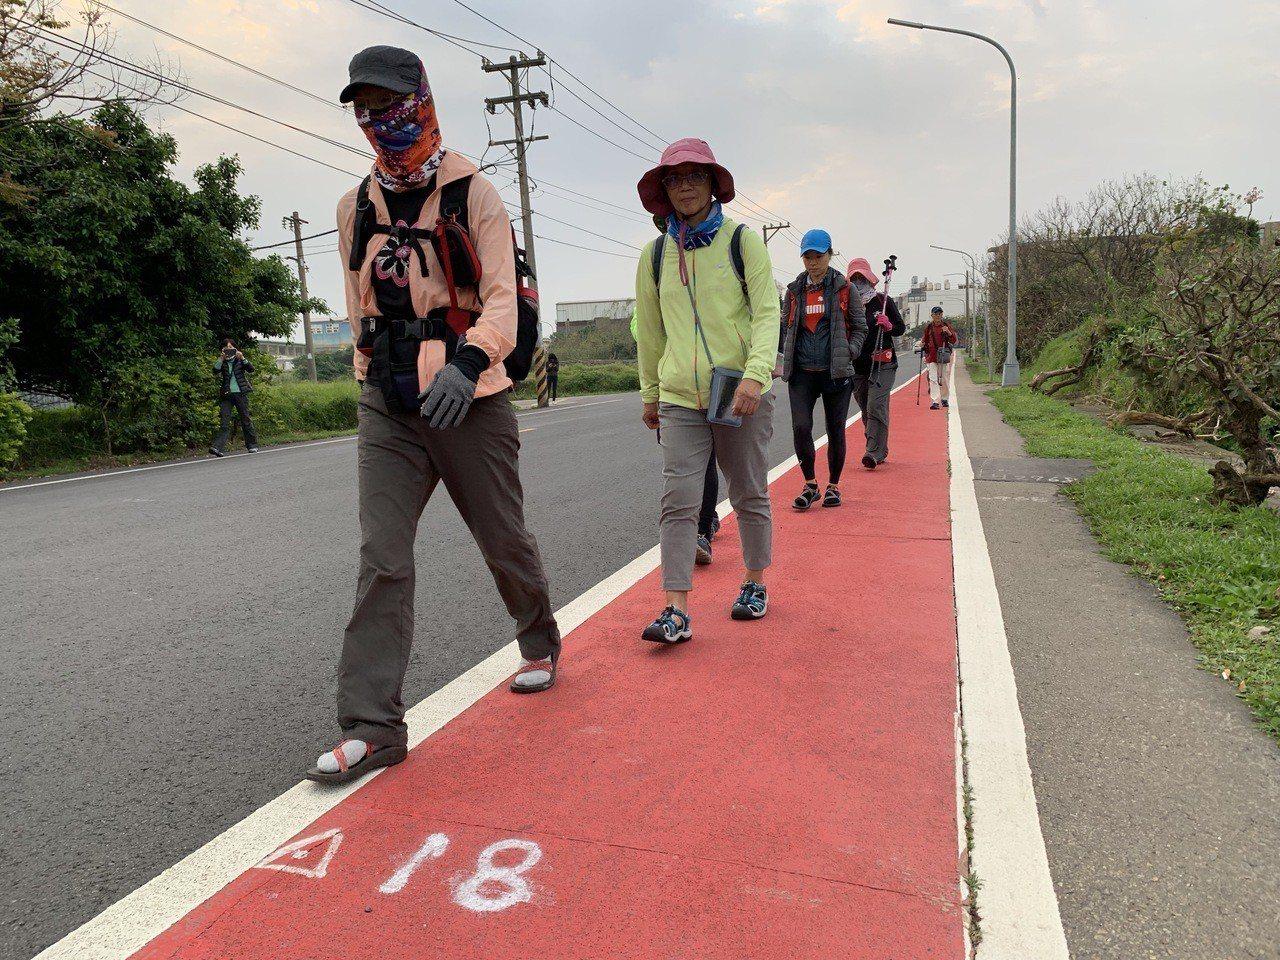 TAMEE舉辦的徒步海濱活動,孩子們要經過競賽才能參加。記者黃昭勇/攝影